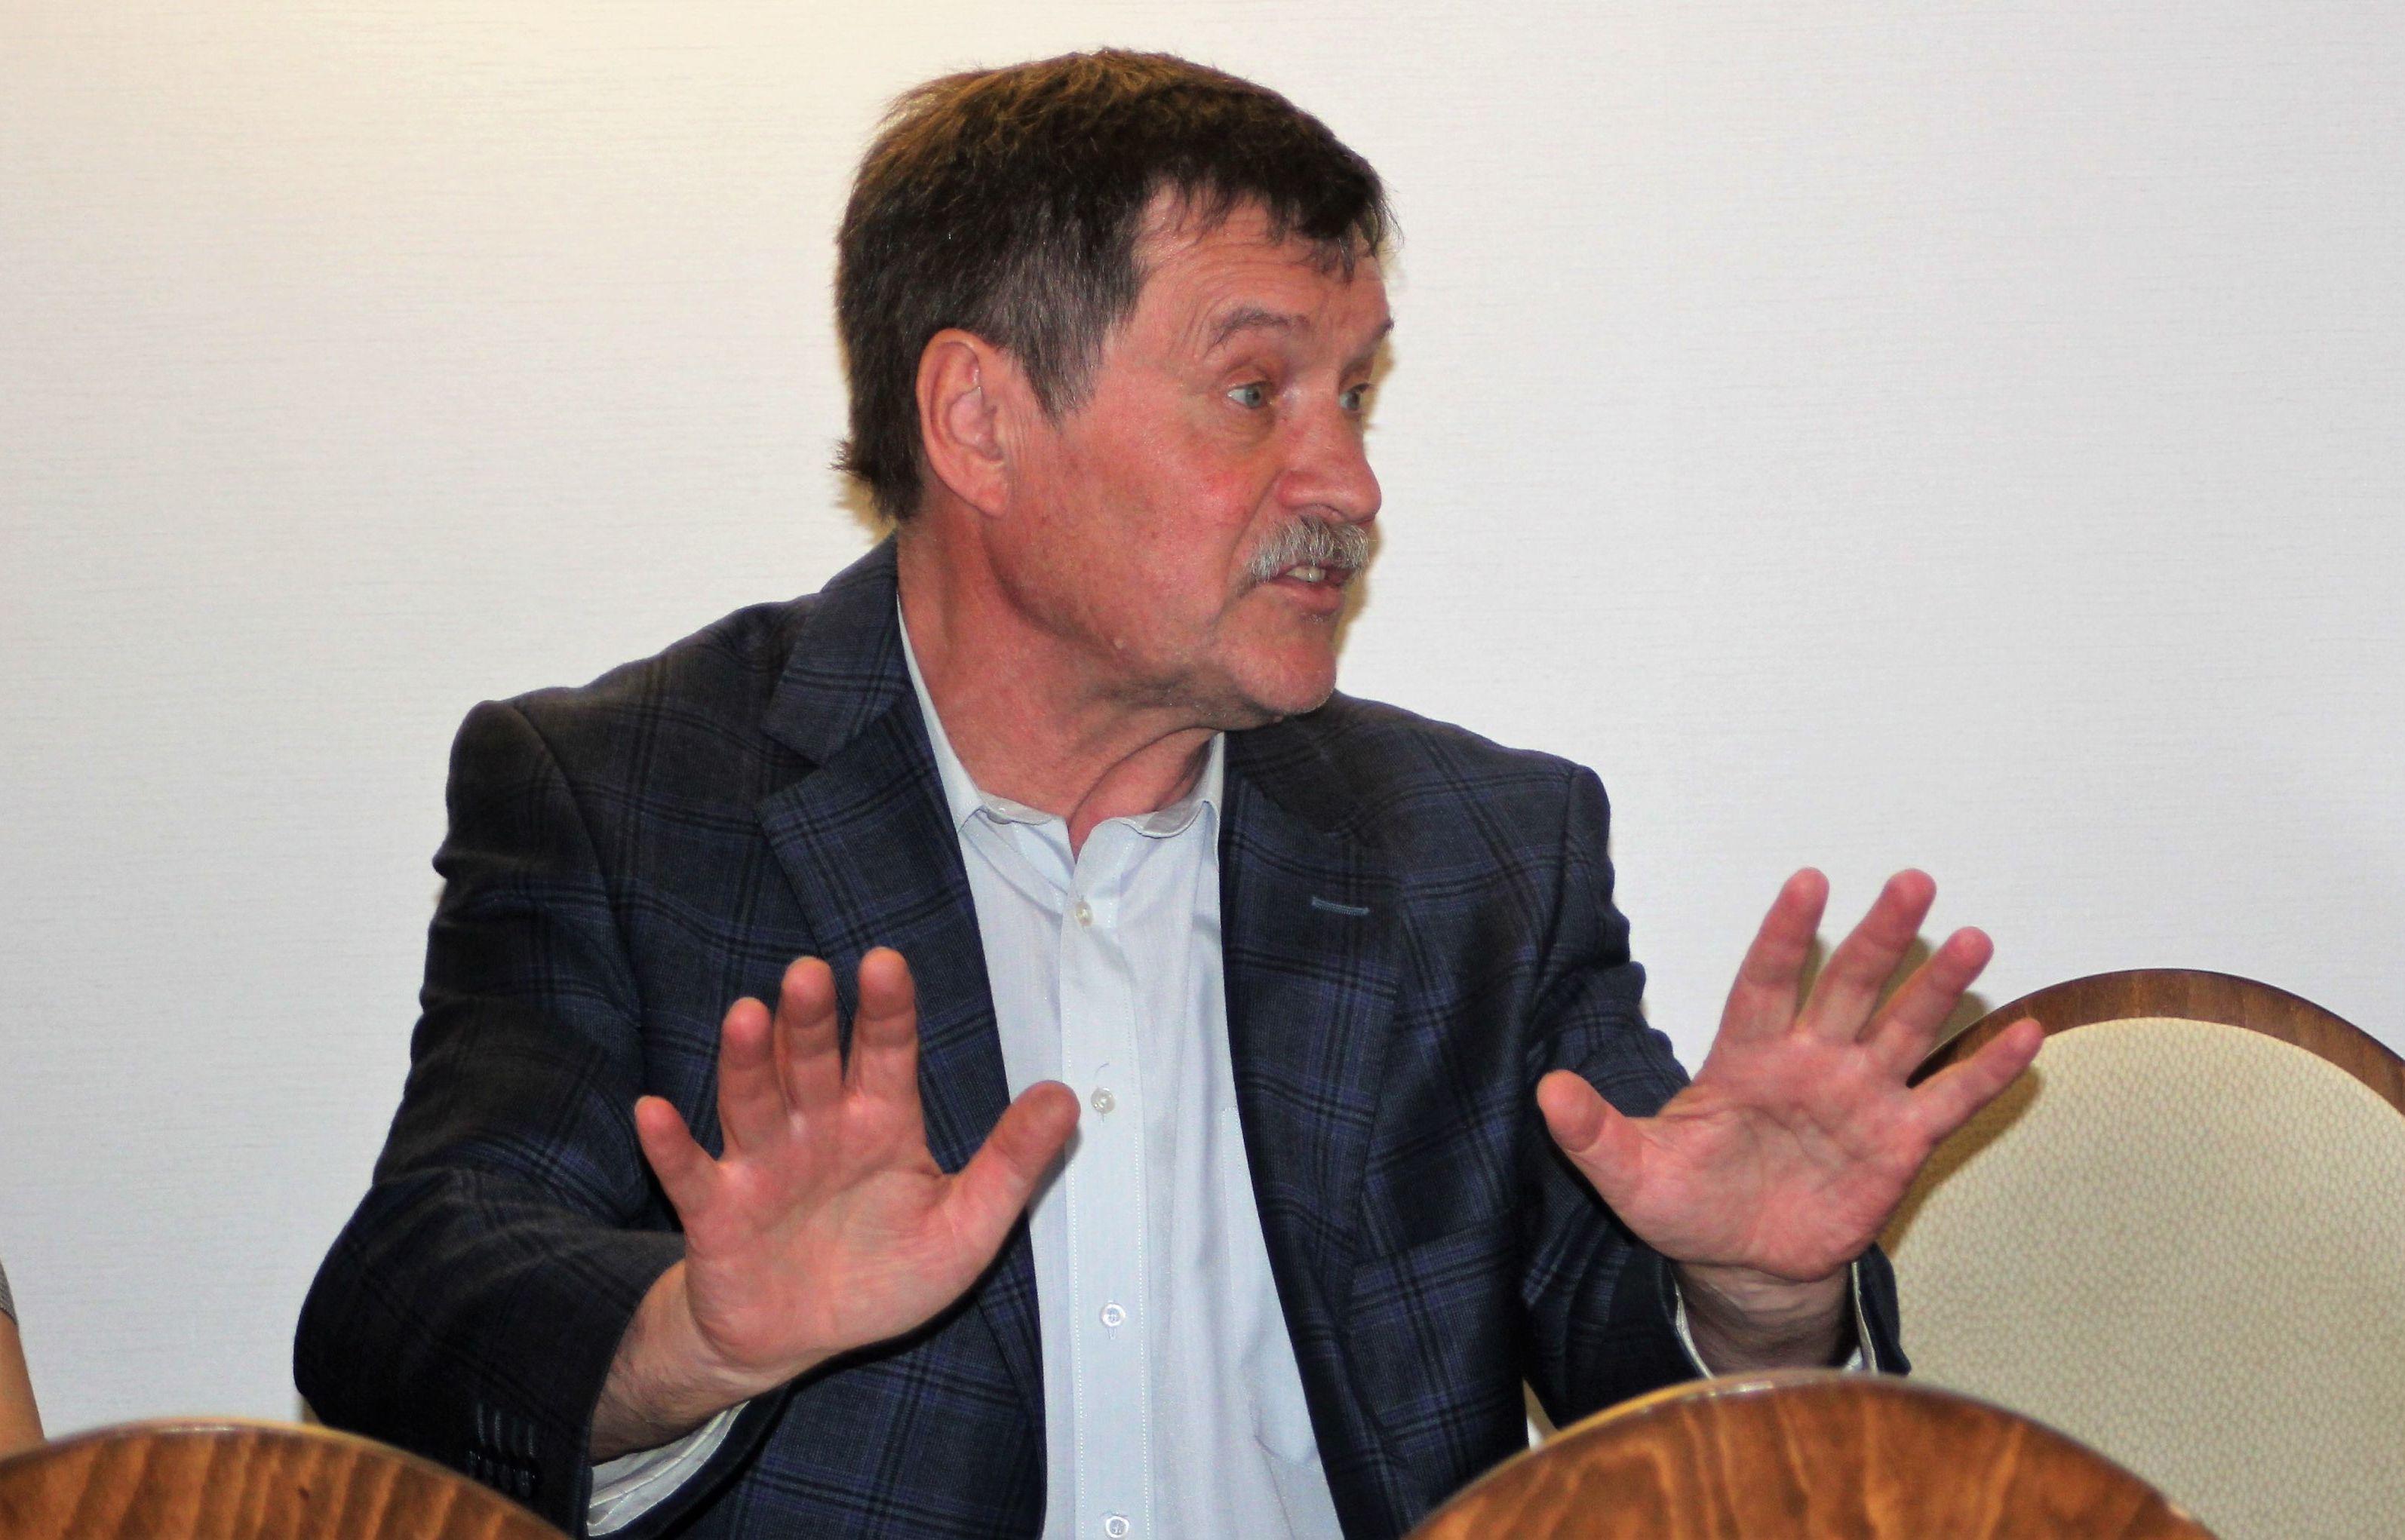 Rosyjski dyplomata Jury Rożkow